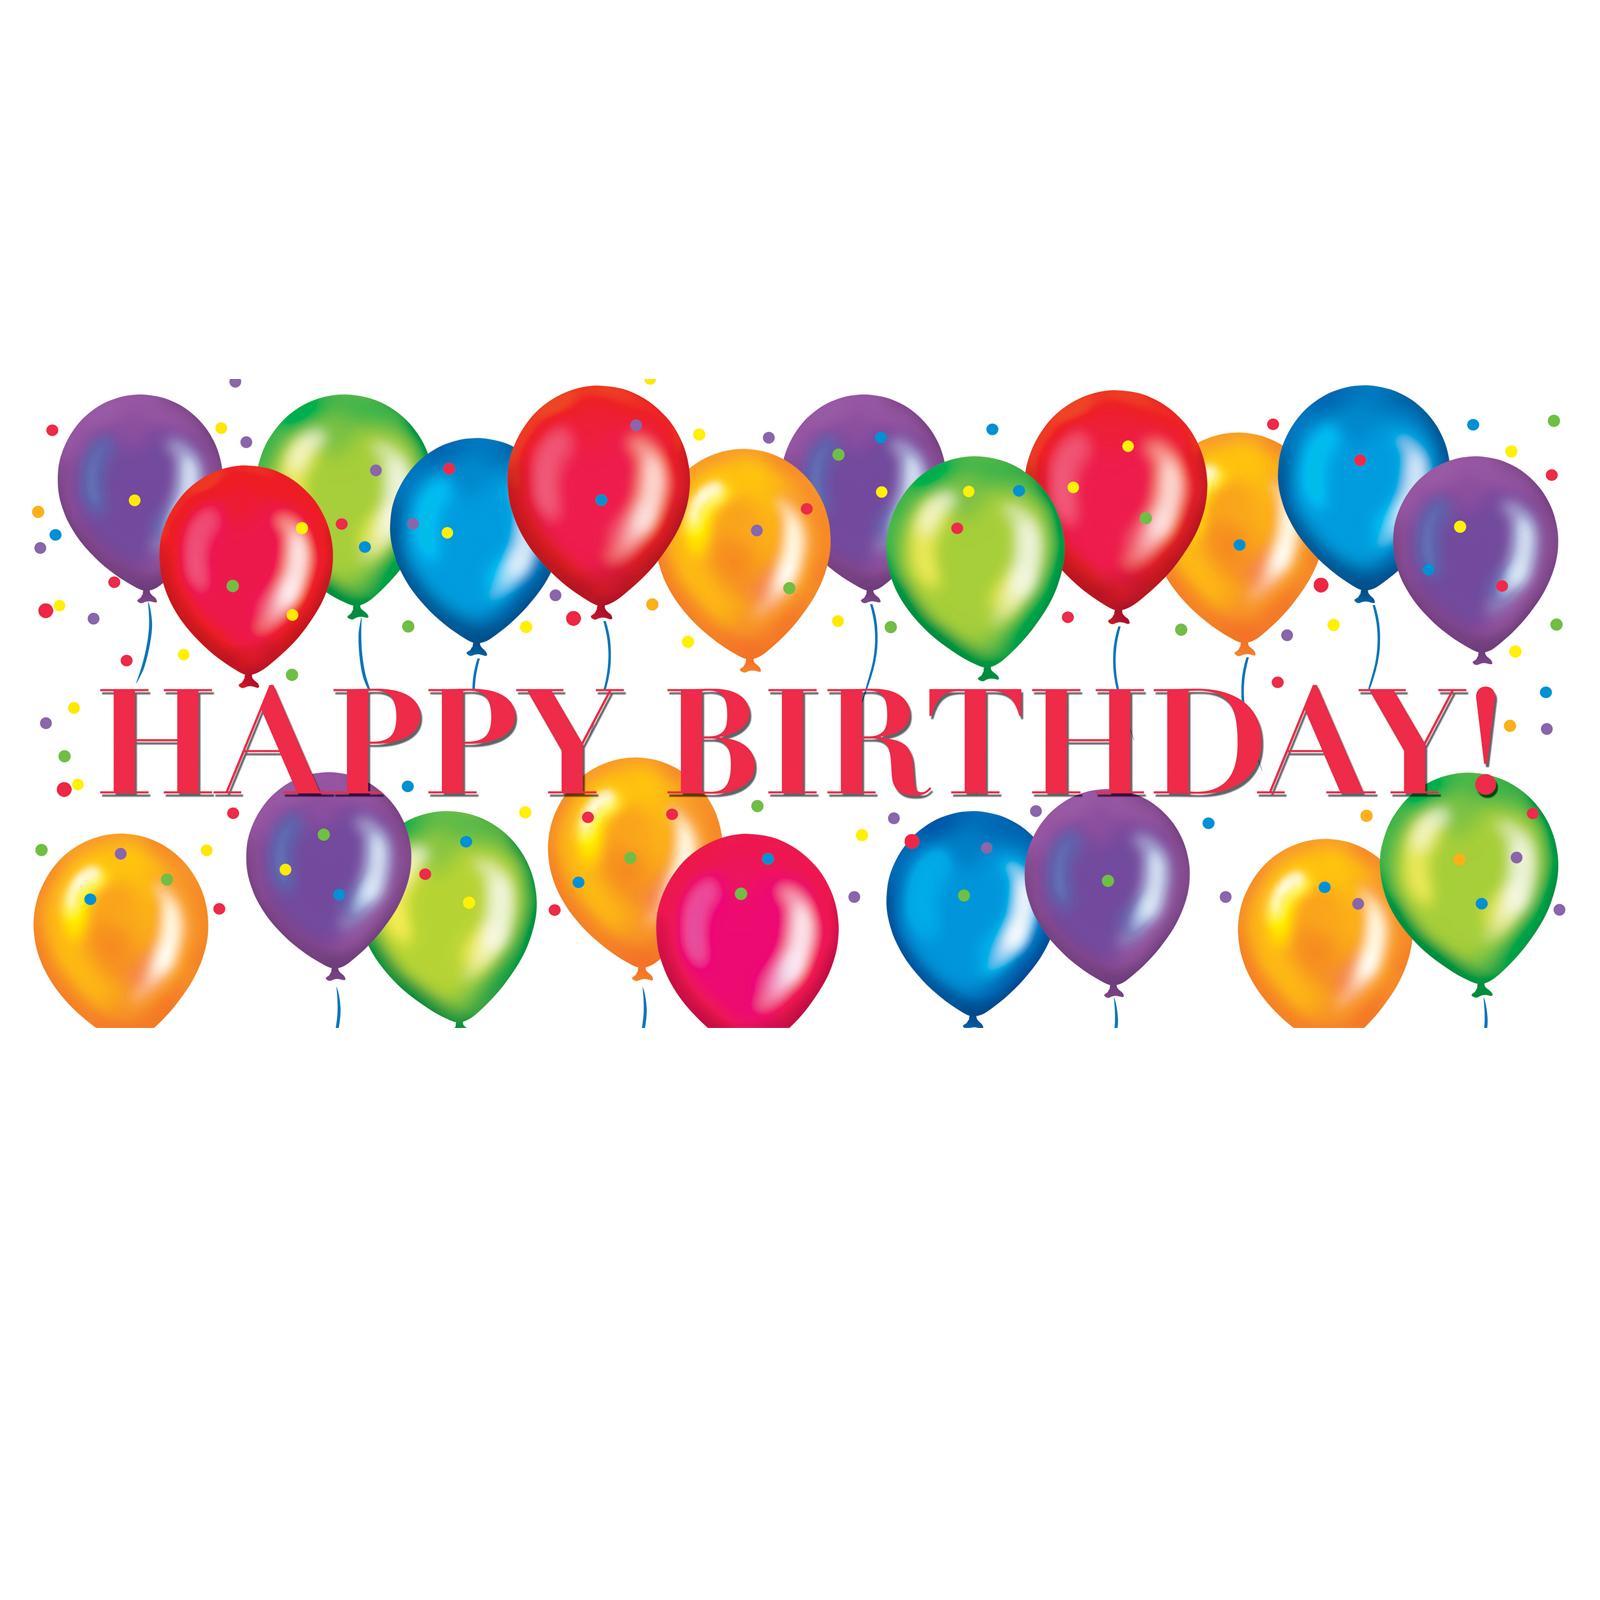 http://4.bp.blogspot.com/-EzFKrc4MPFo/UUXr8P8SDaI/AAAAAAABMlQ/RbeSJcR8AuA/s1600/hinh+nen+sinh+nhat,+happy+birthday+wallpaper+(25).jpg